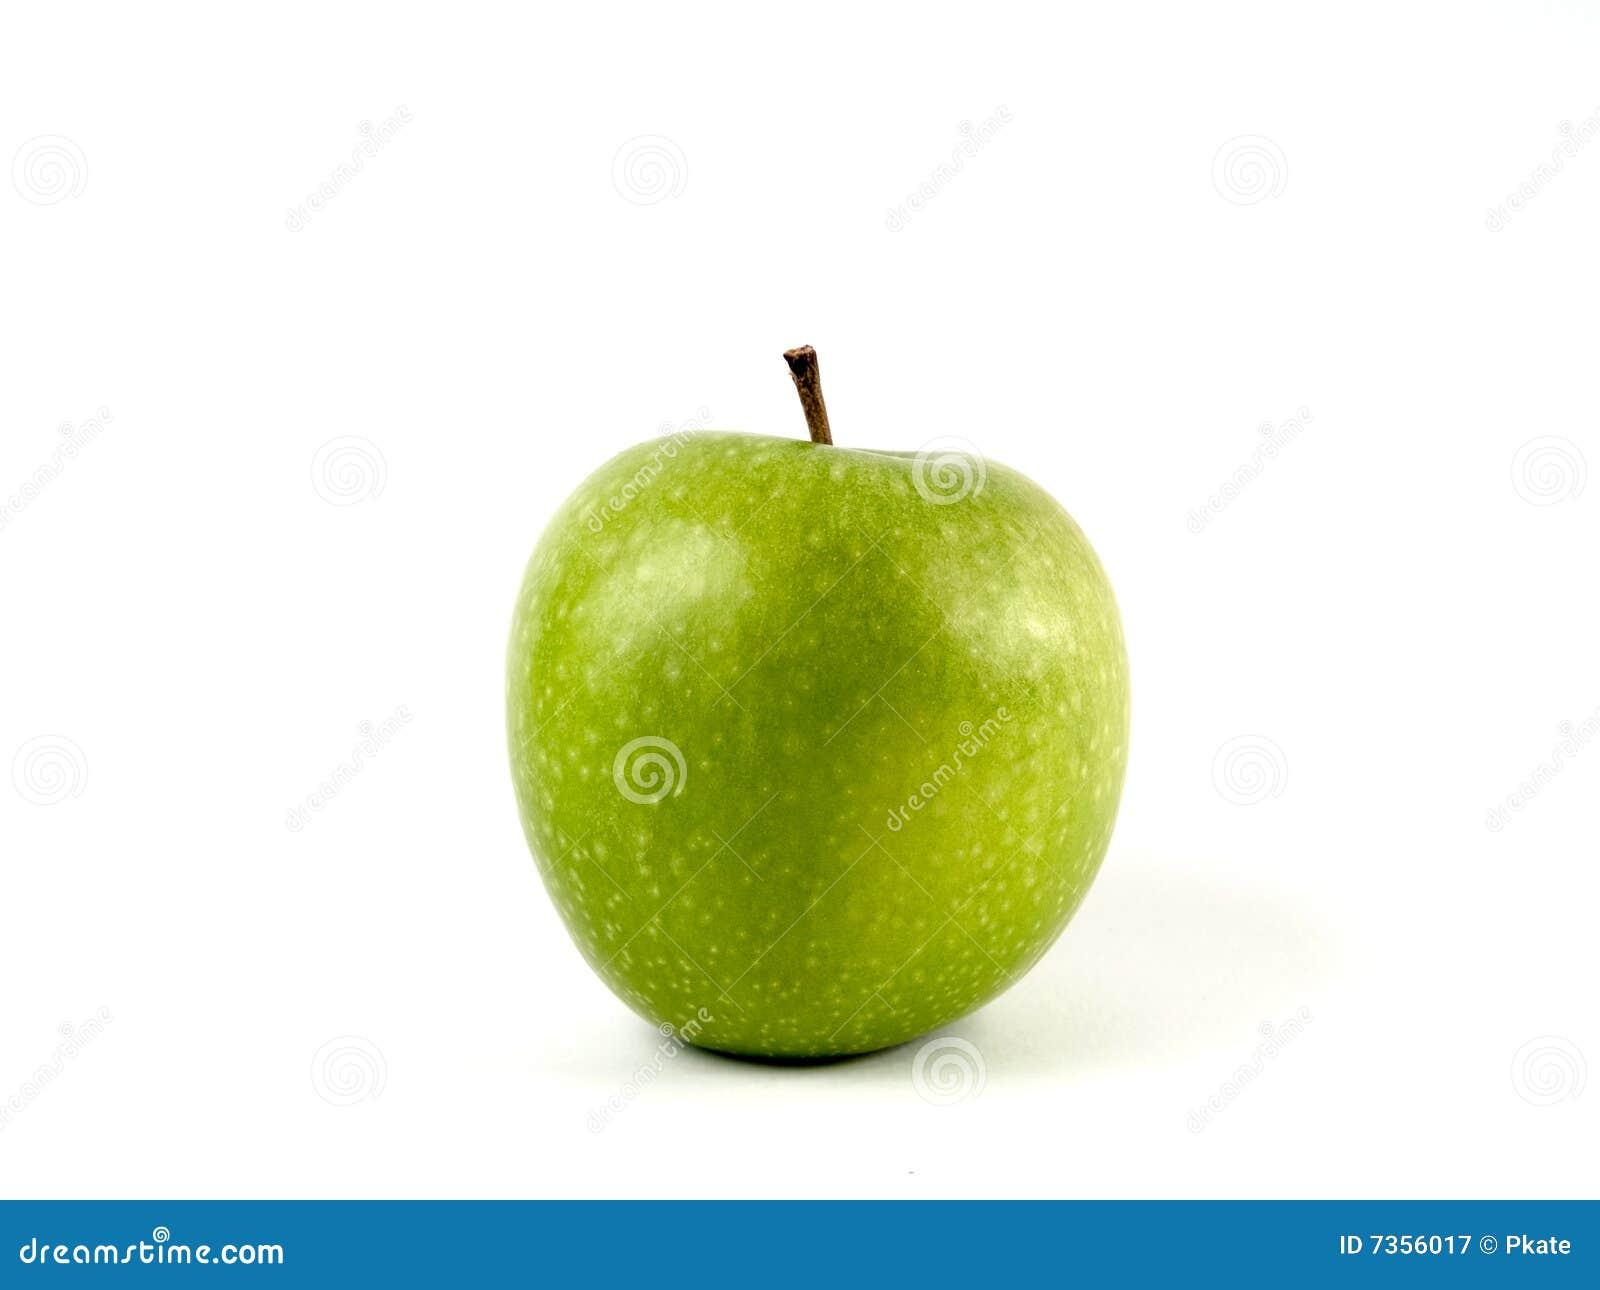 Carbs in a green apple